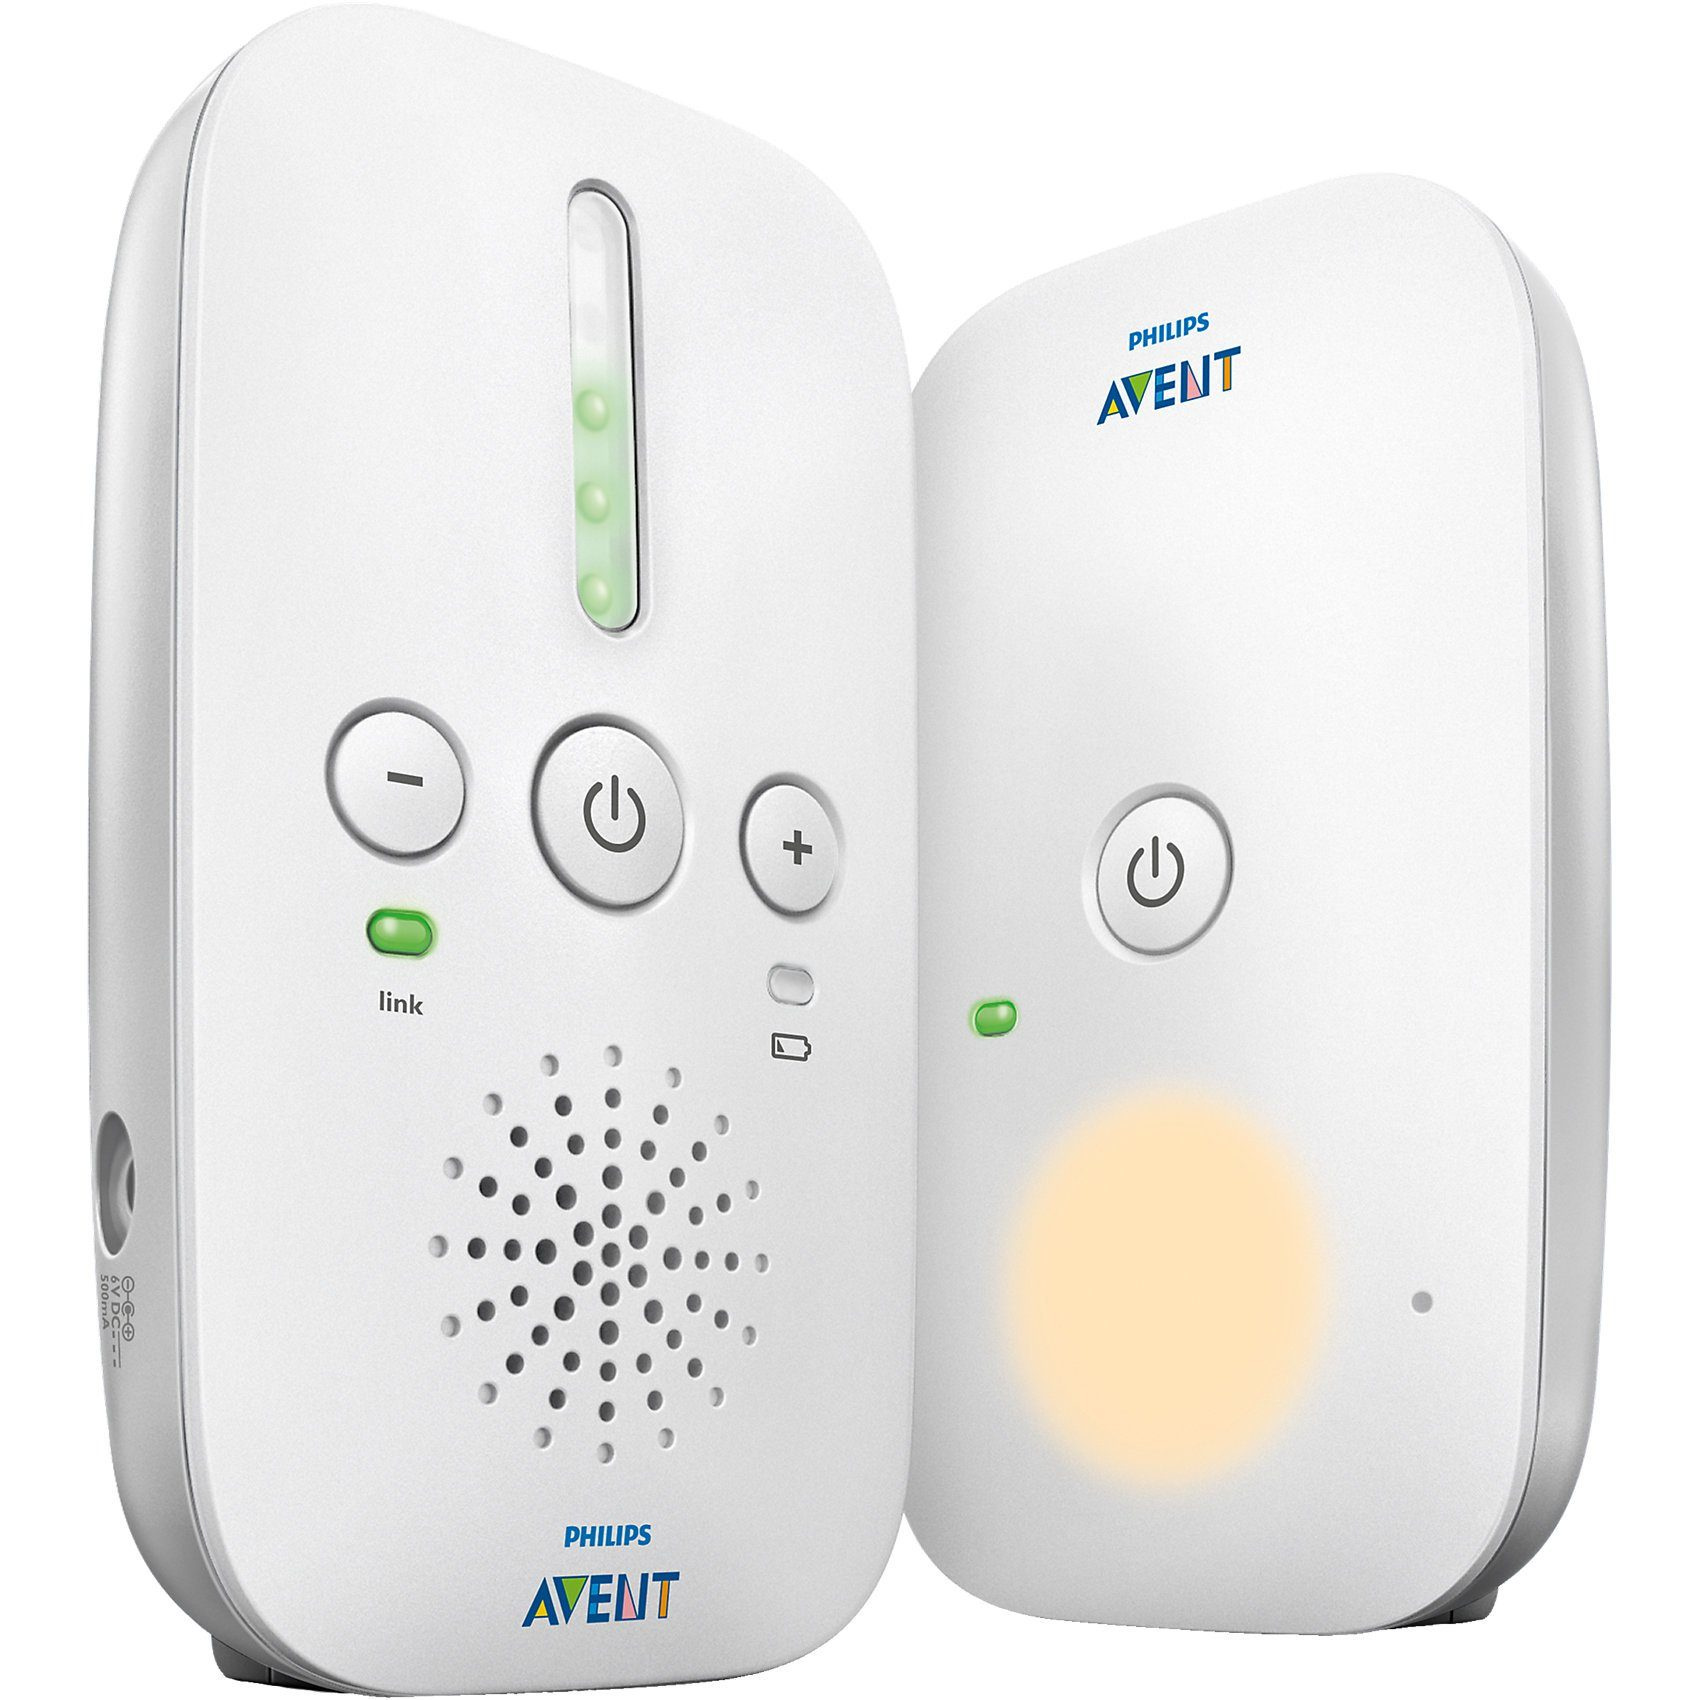 Philips AVENT Audio Babyphone DECT, SCD502/26